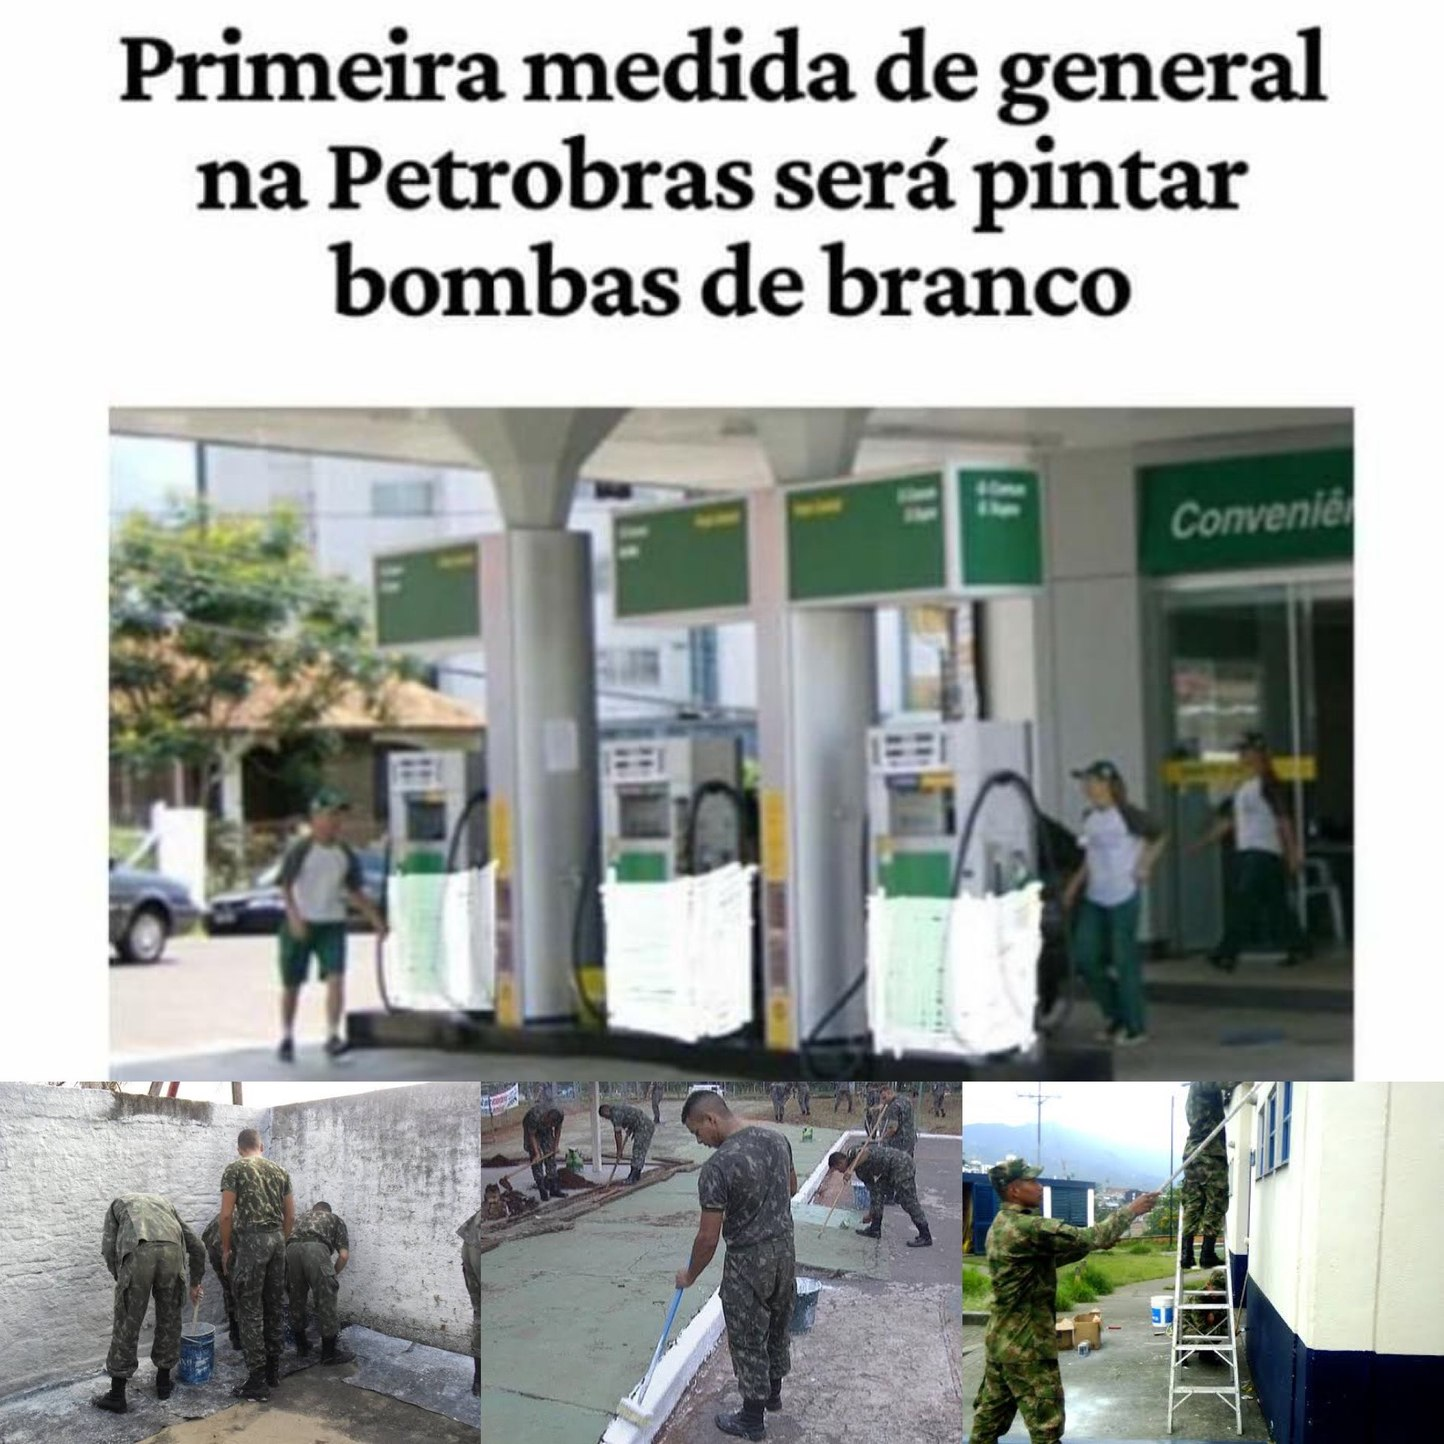 general na Petrobras - meme